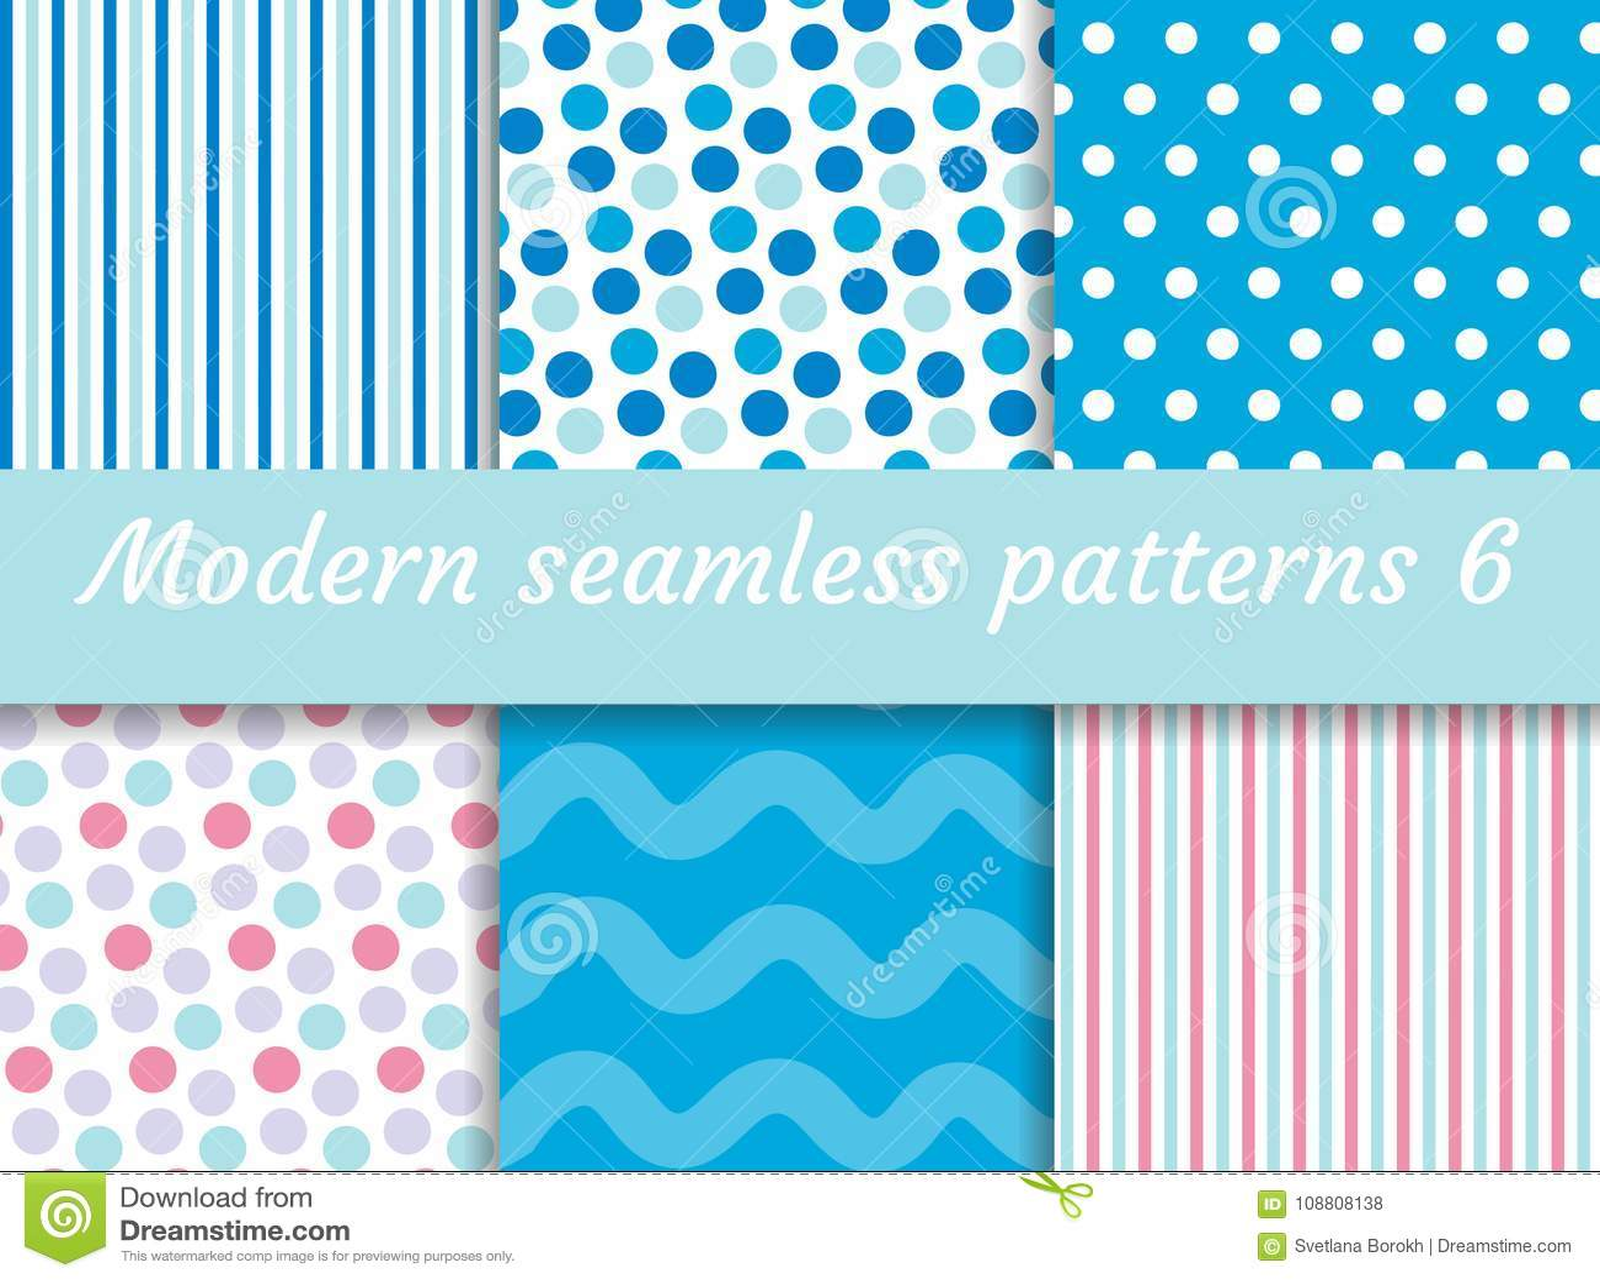 Polka dot, strips wave seamless pattern set. Digital Paper collection, modern style. Scrapbooking Kit. Vector